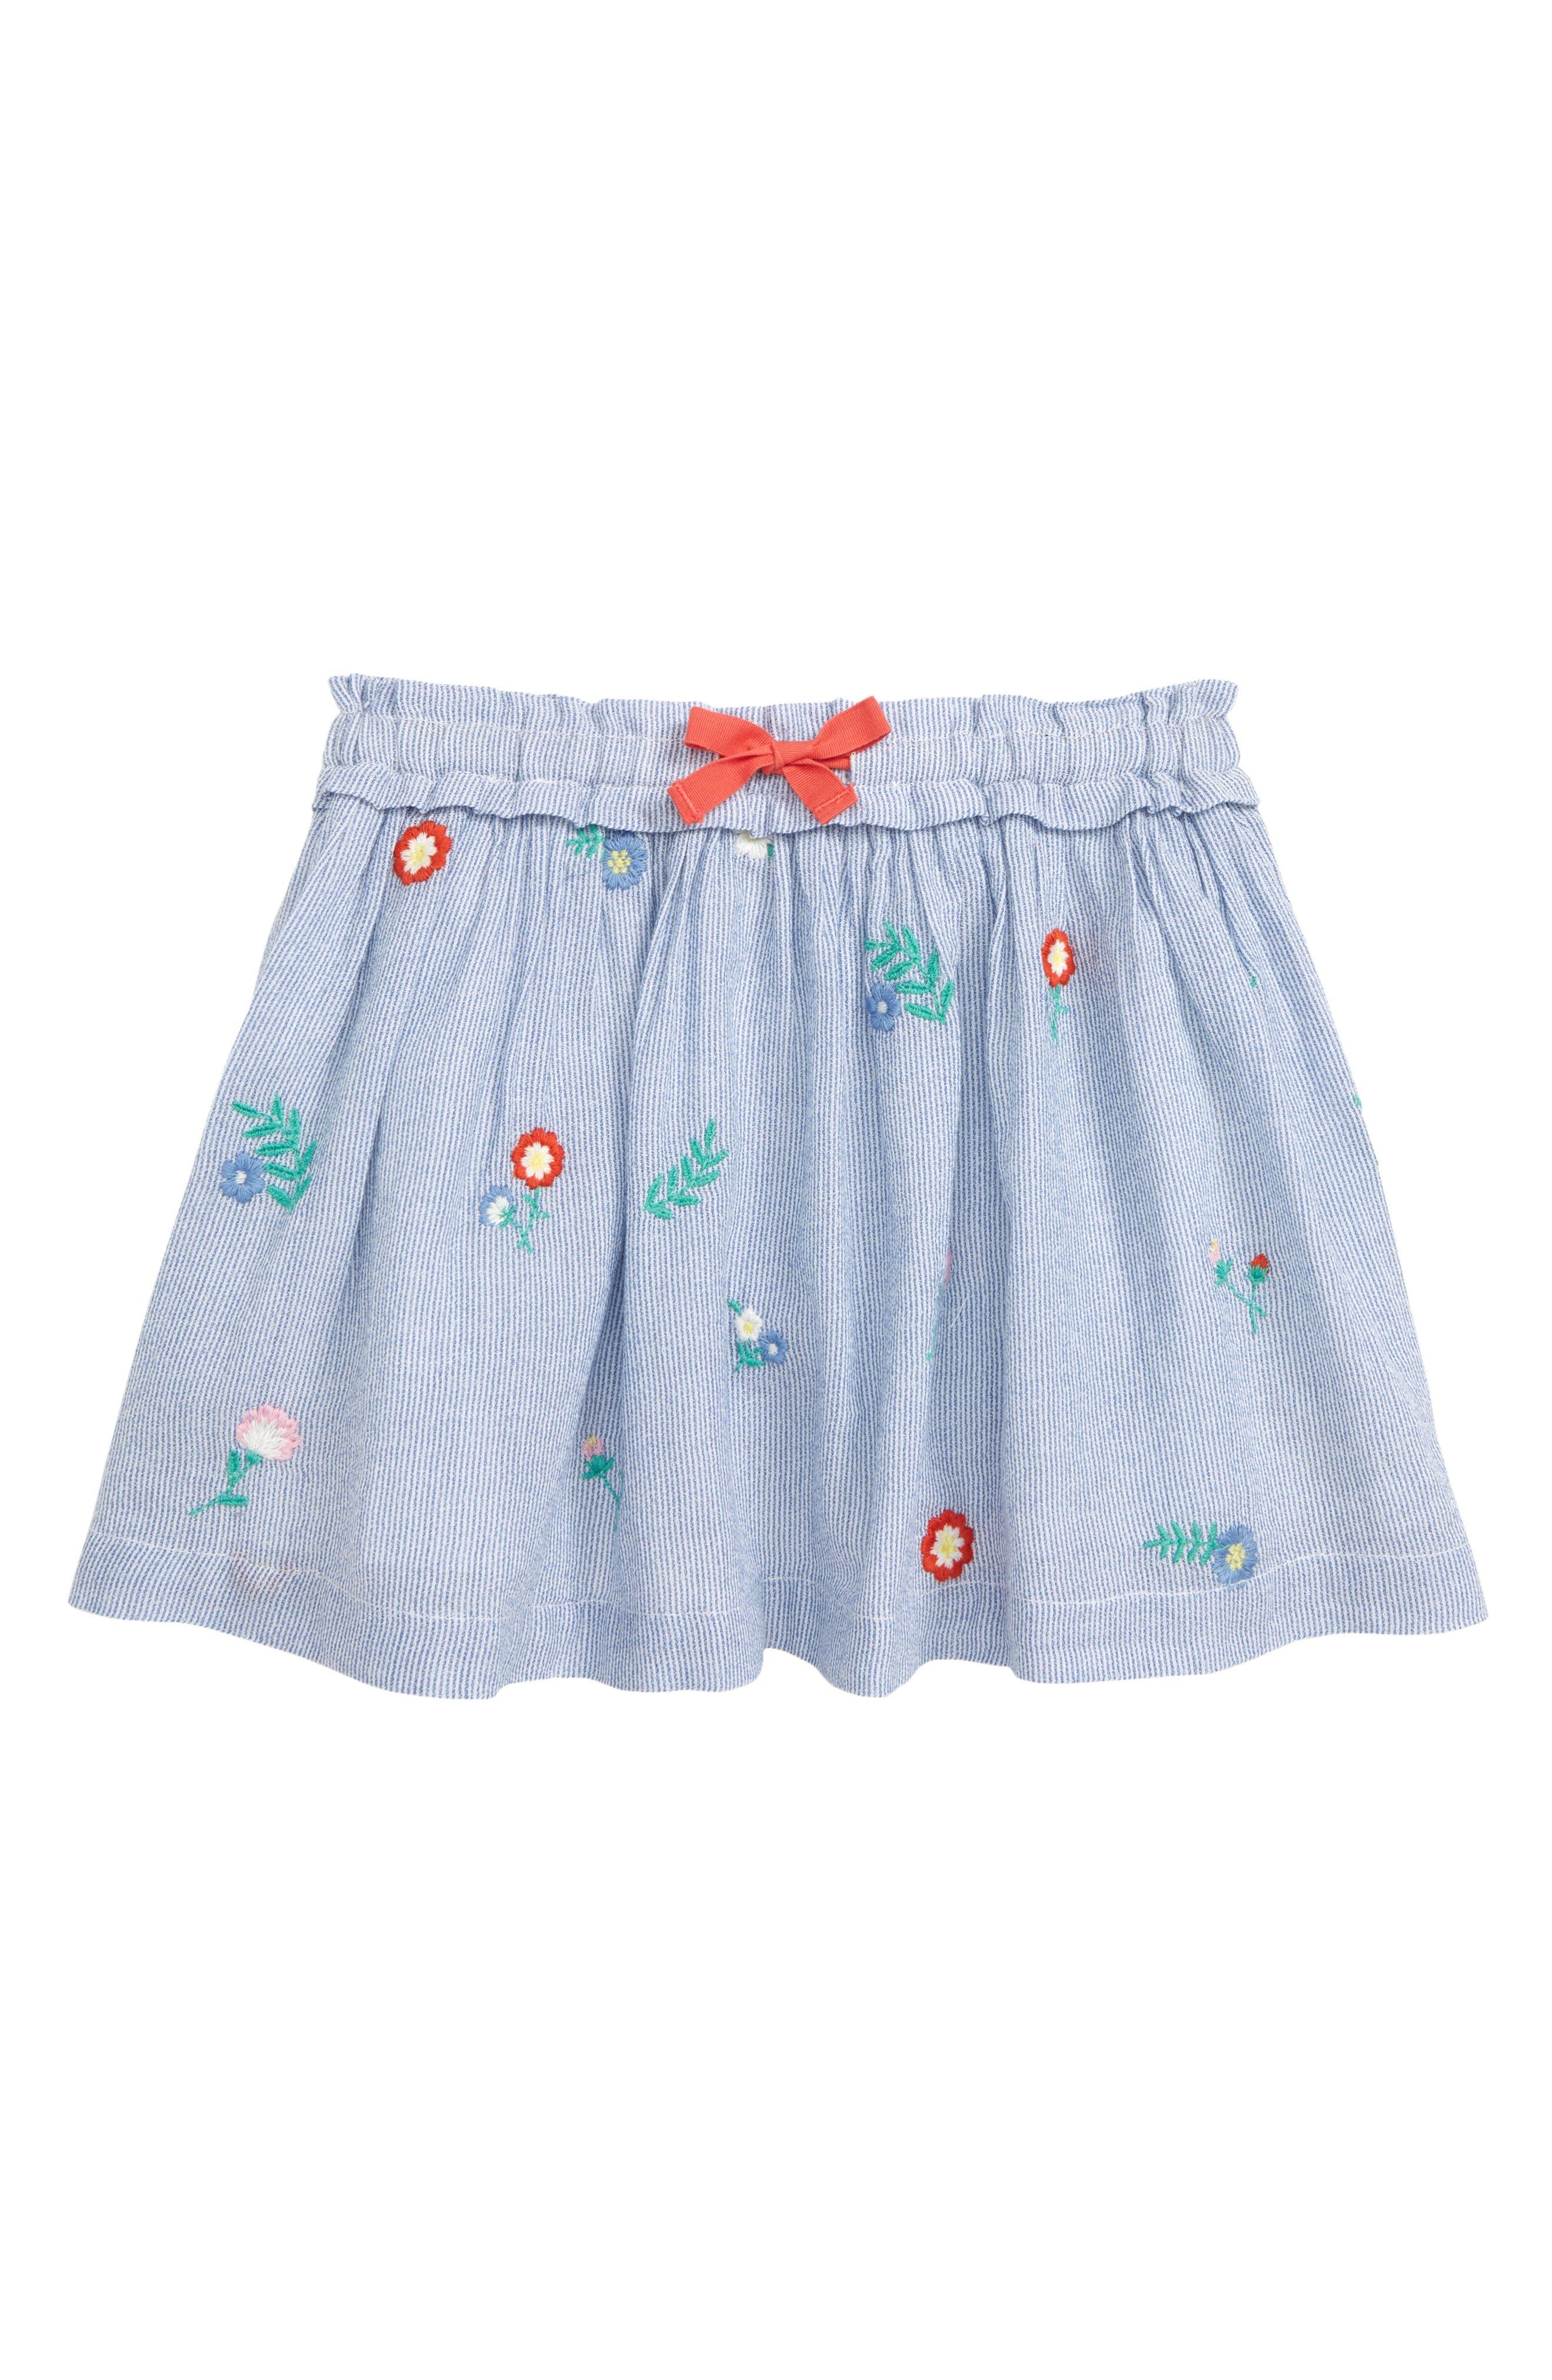 3119a3ea5e6c Mini Boden Kids  Clothing